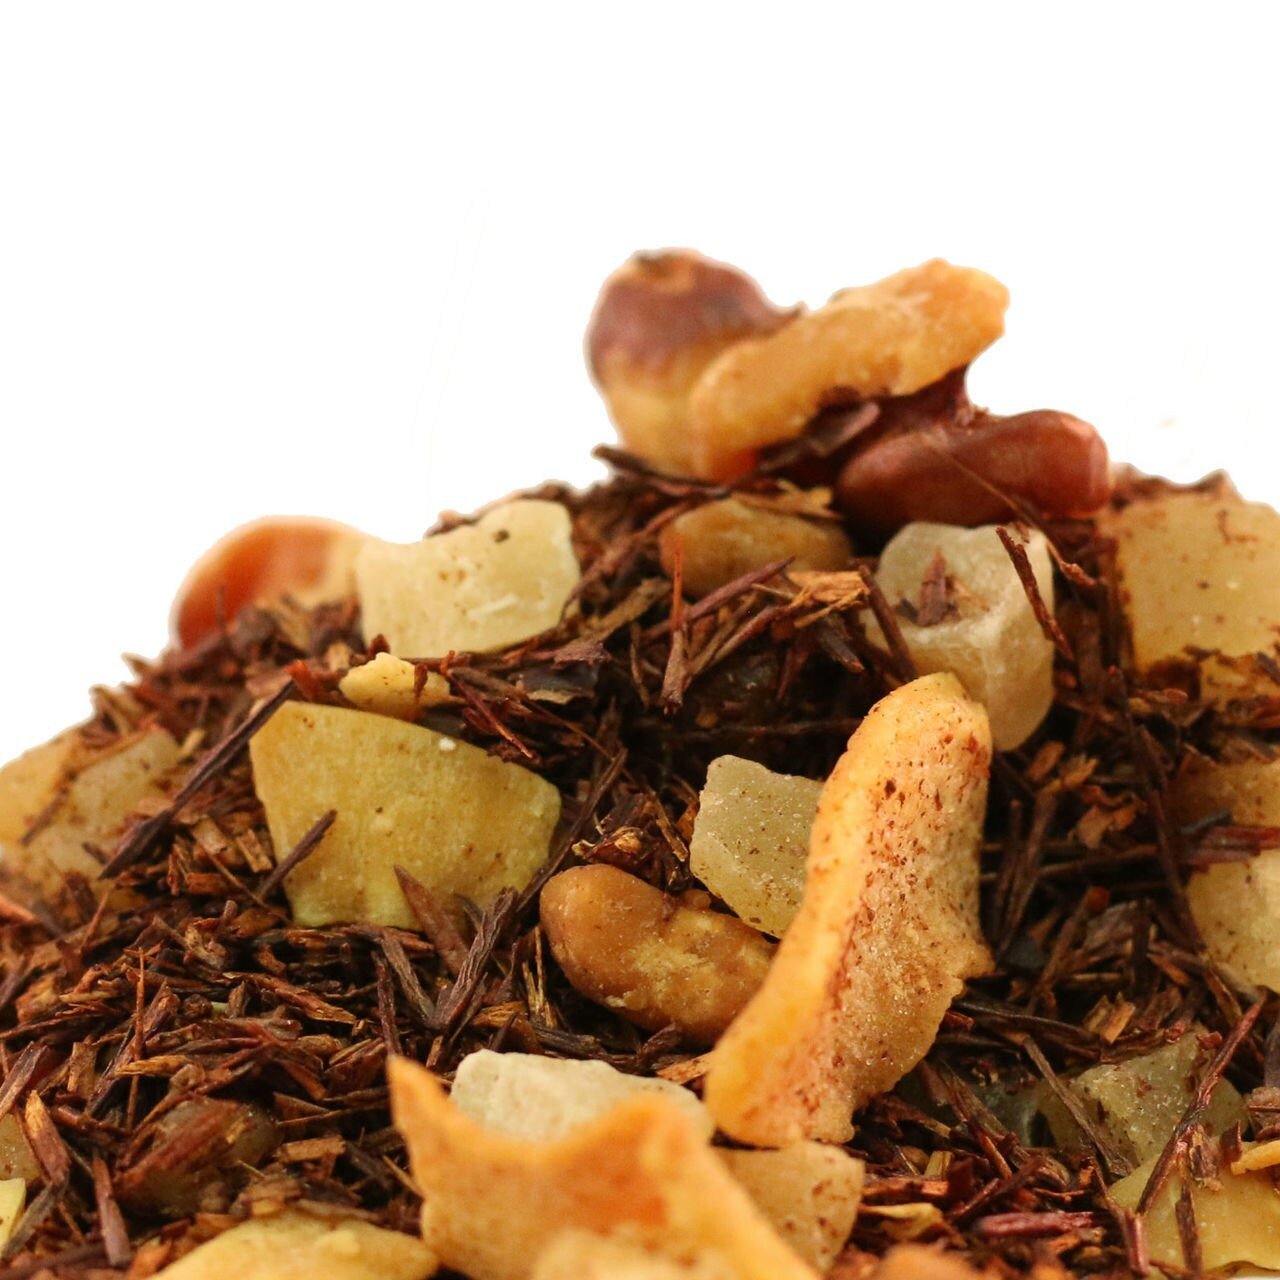 Toasted Hazelnut, Almond and Vanilla Rooibos Herbal Tea